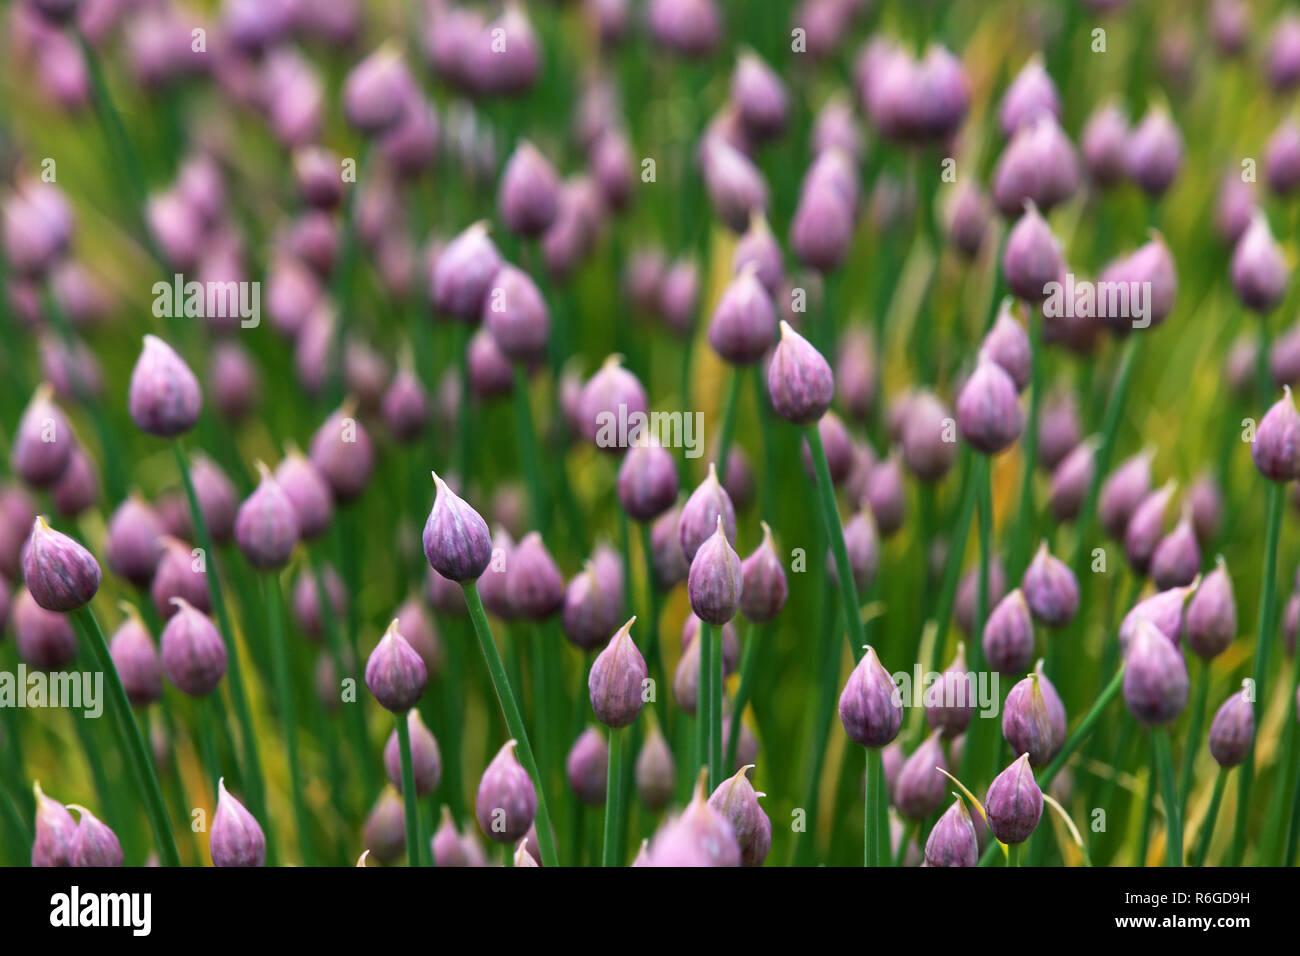 flowering chive allium schoenoprasum in landscape format Stock Photo